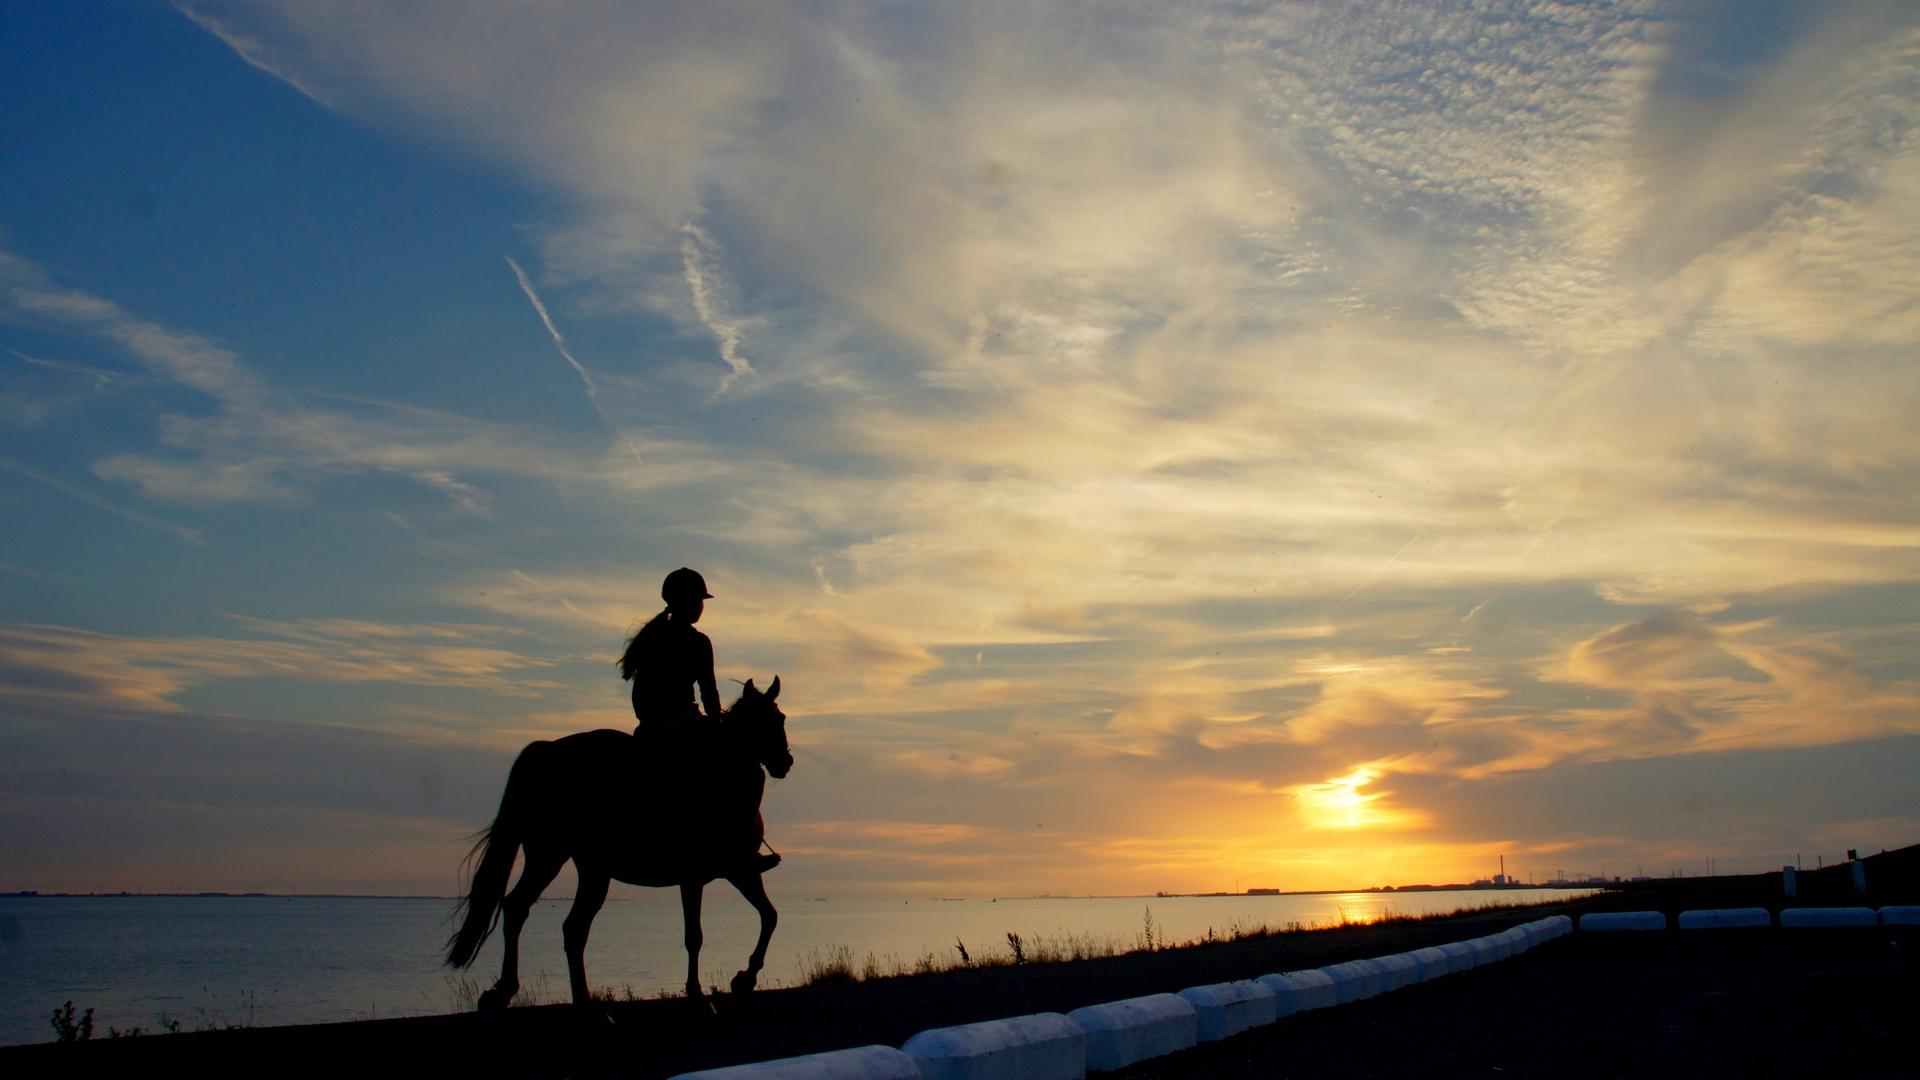 Download wallpaper 1920x1080 horseback rider girl silhouette 1920x1080